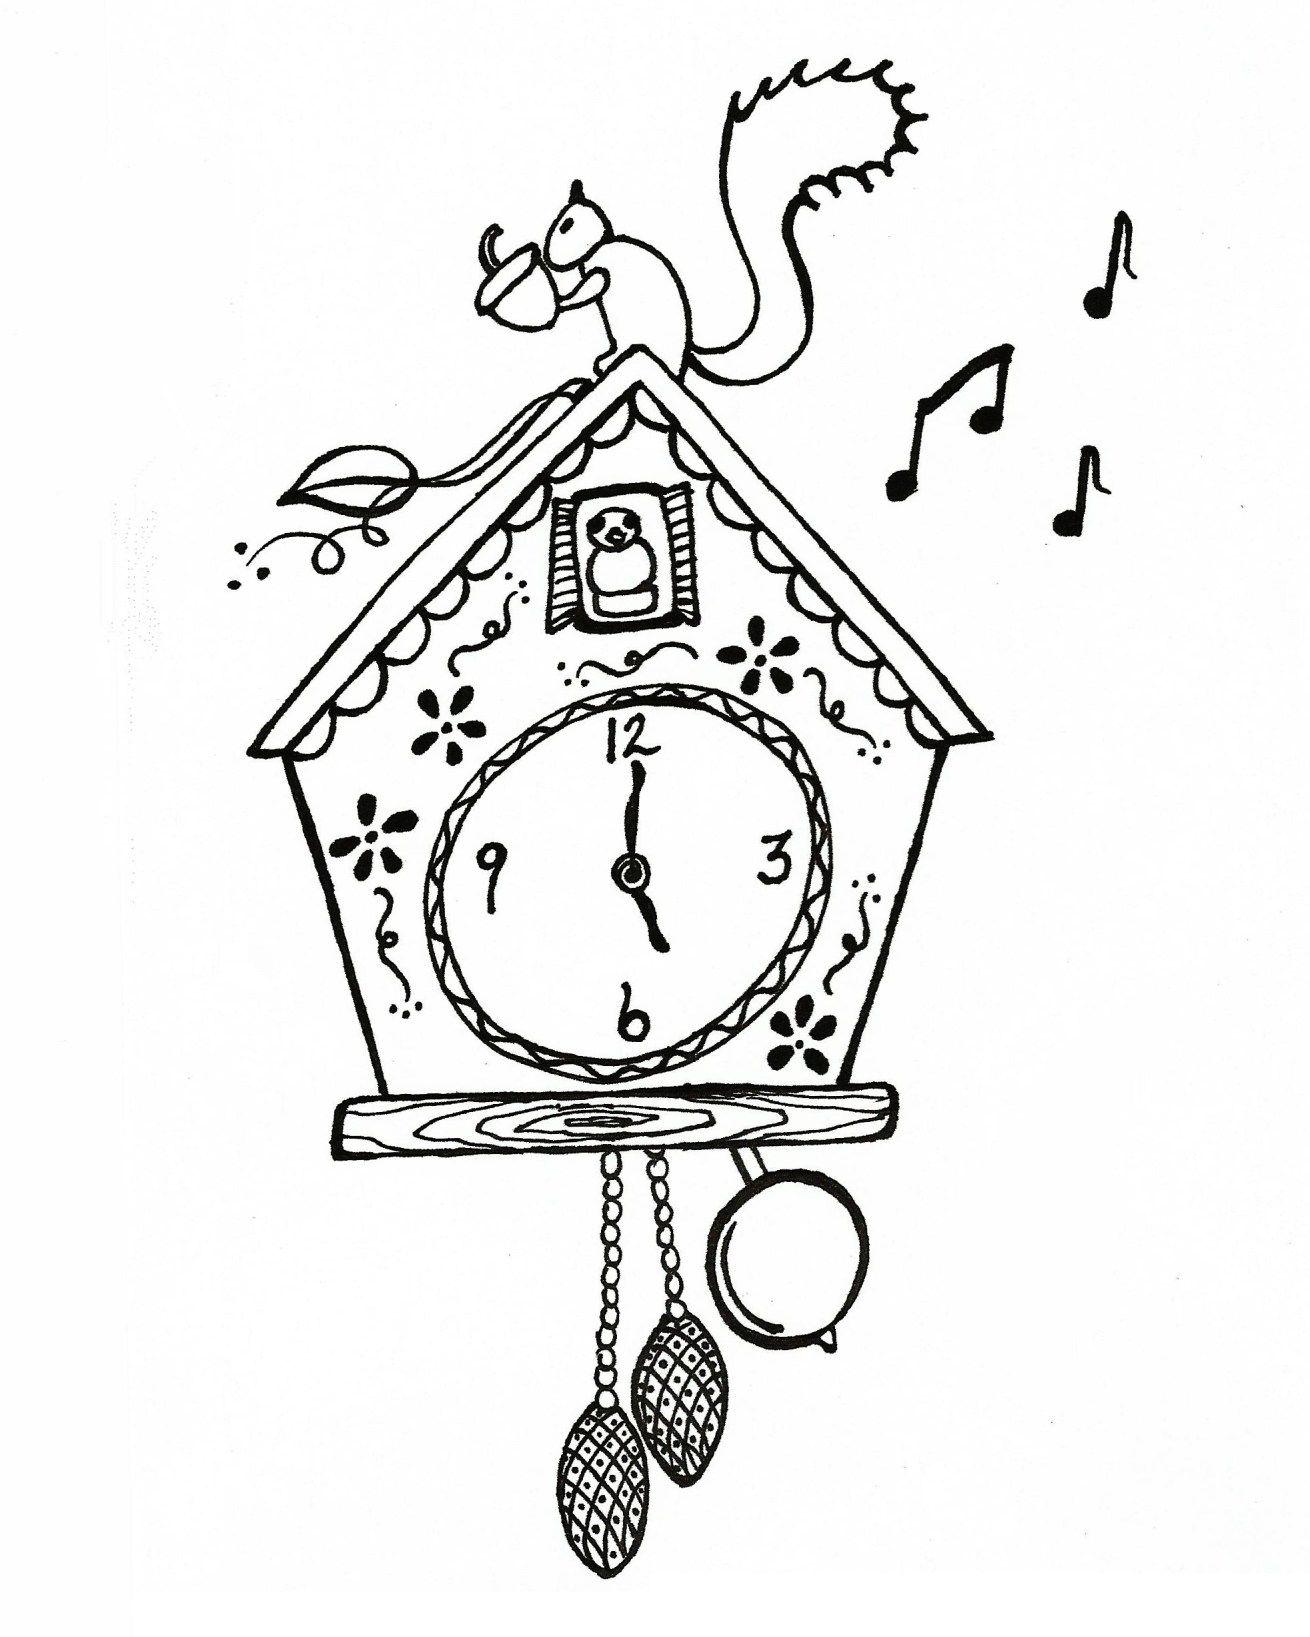 Cuckoo Clock Clock Drawings Cuckoo Clock Coloring Pages For Kids